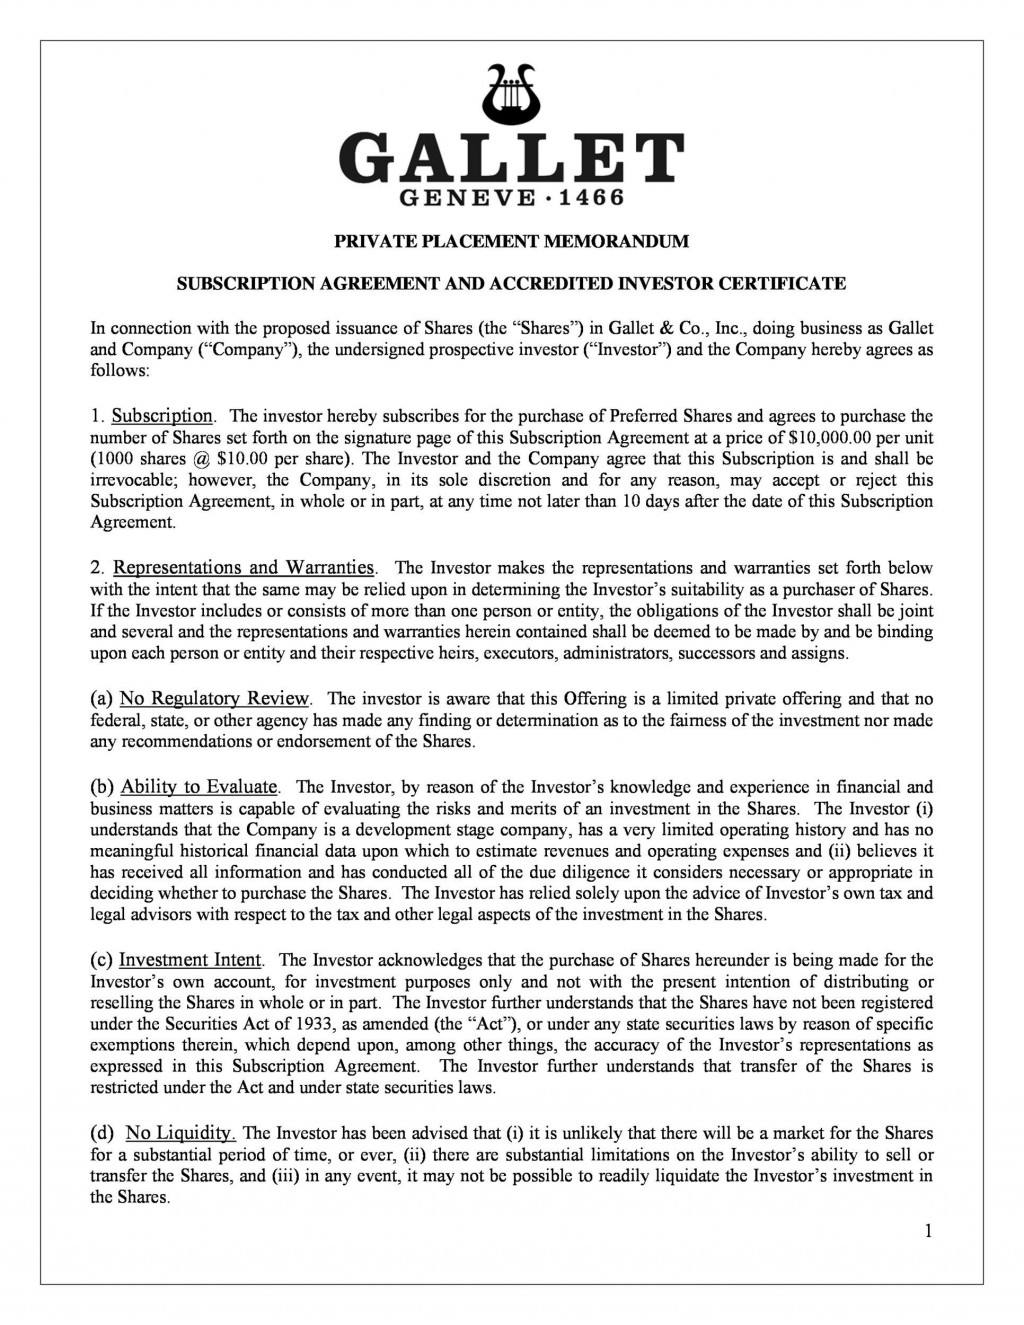 009 Excellent Private Placement Memorandum Format Concept  Template Canada Form UkLarge